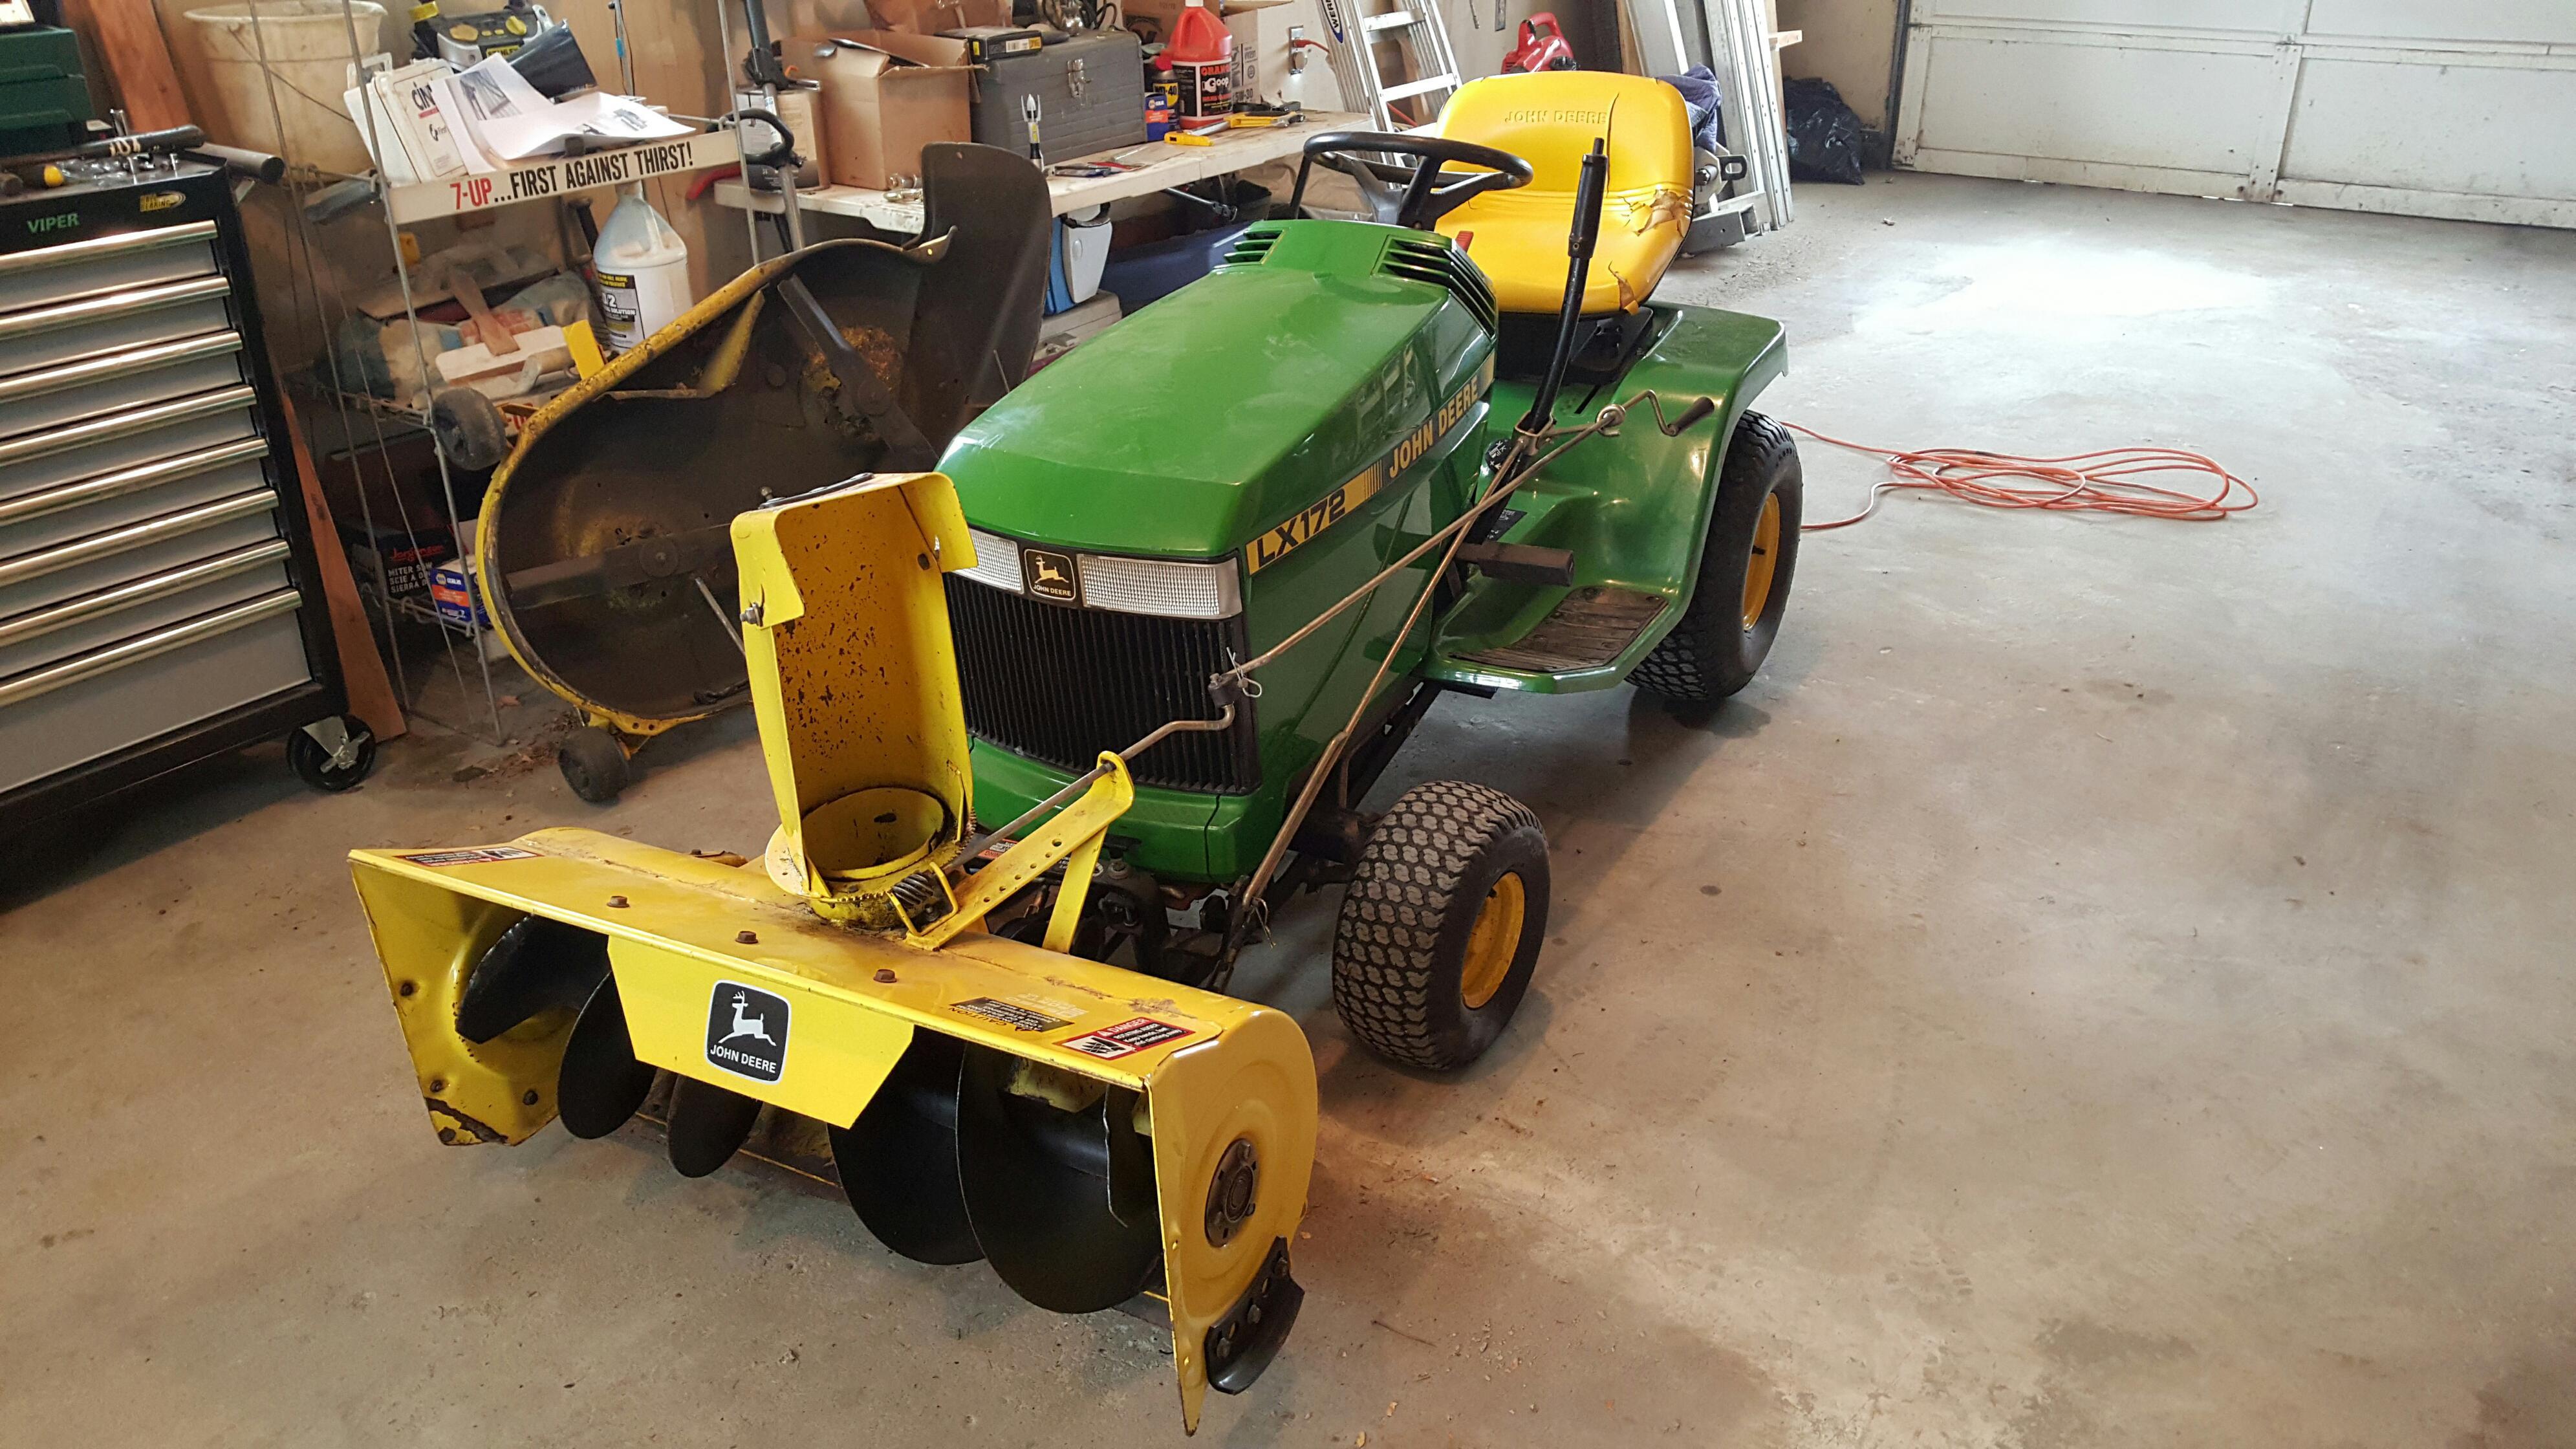 John Deere 172 Lawn Tractor : John deere lx snow blower not blowing out chute